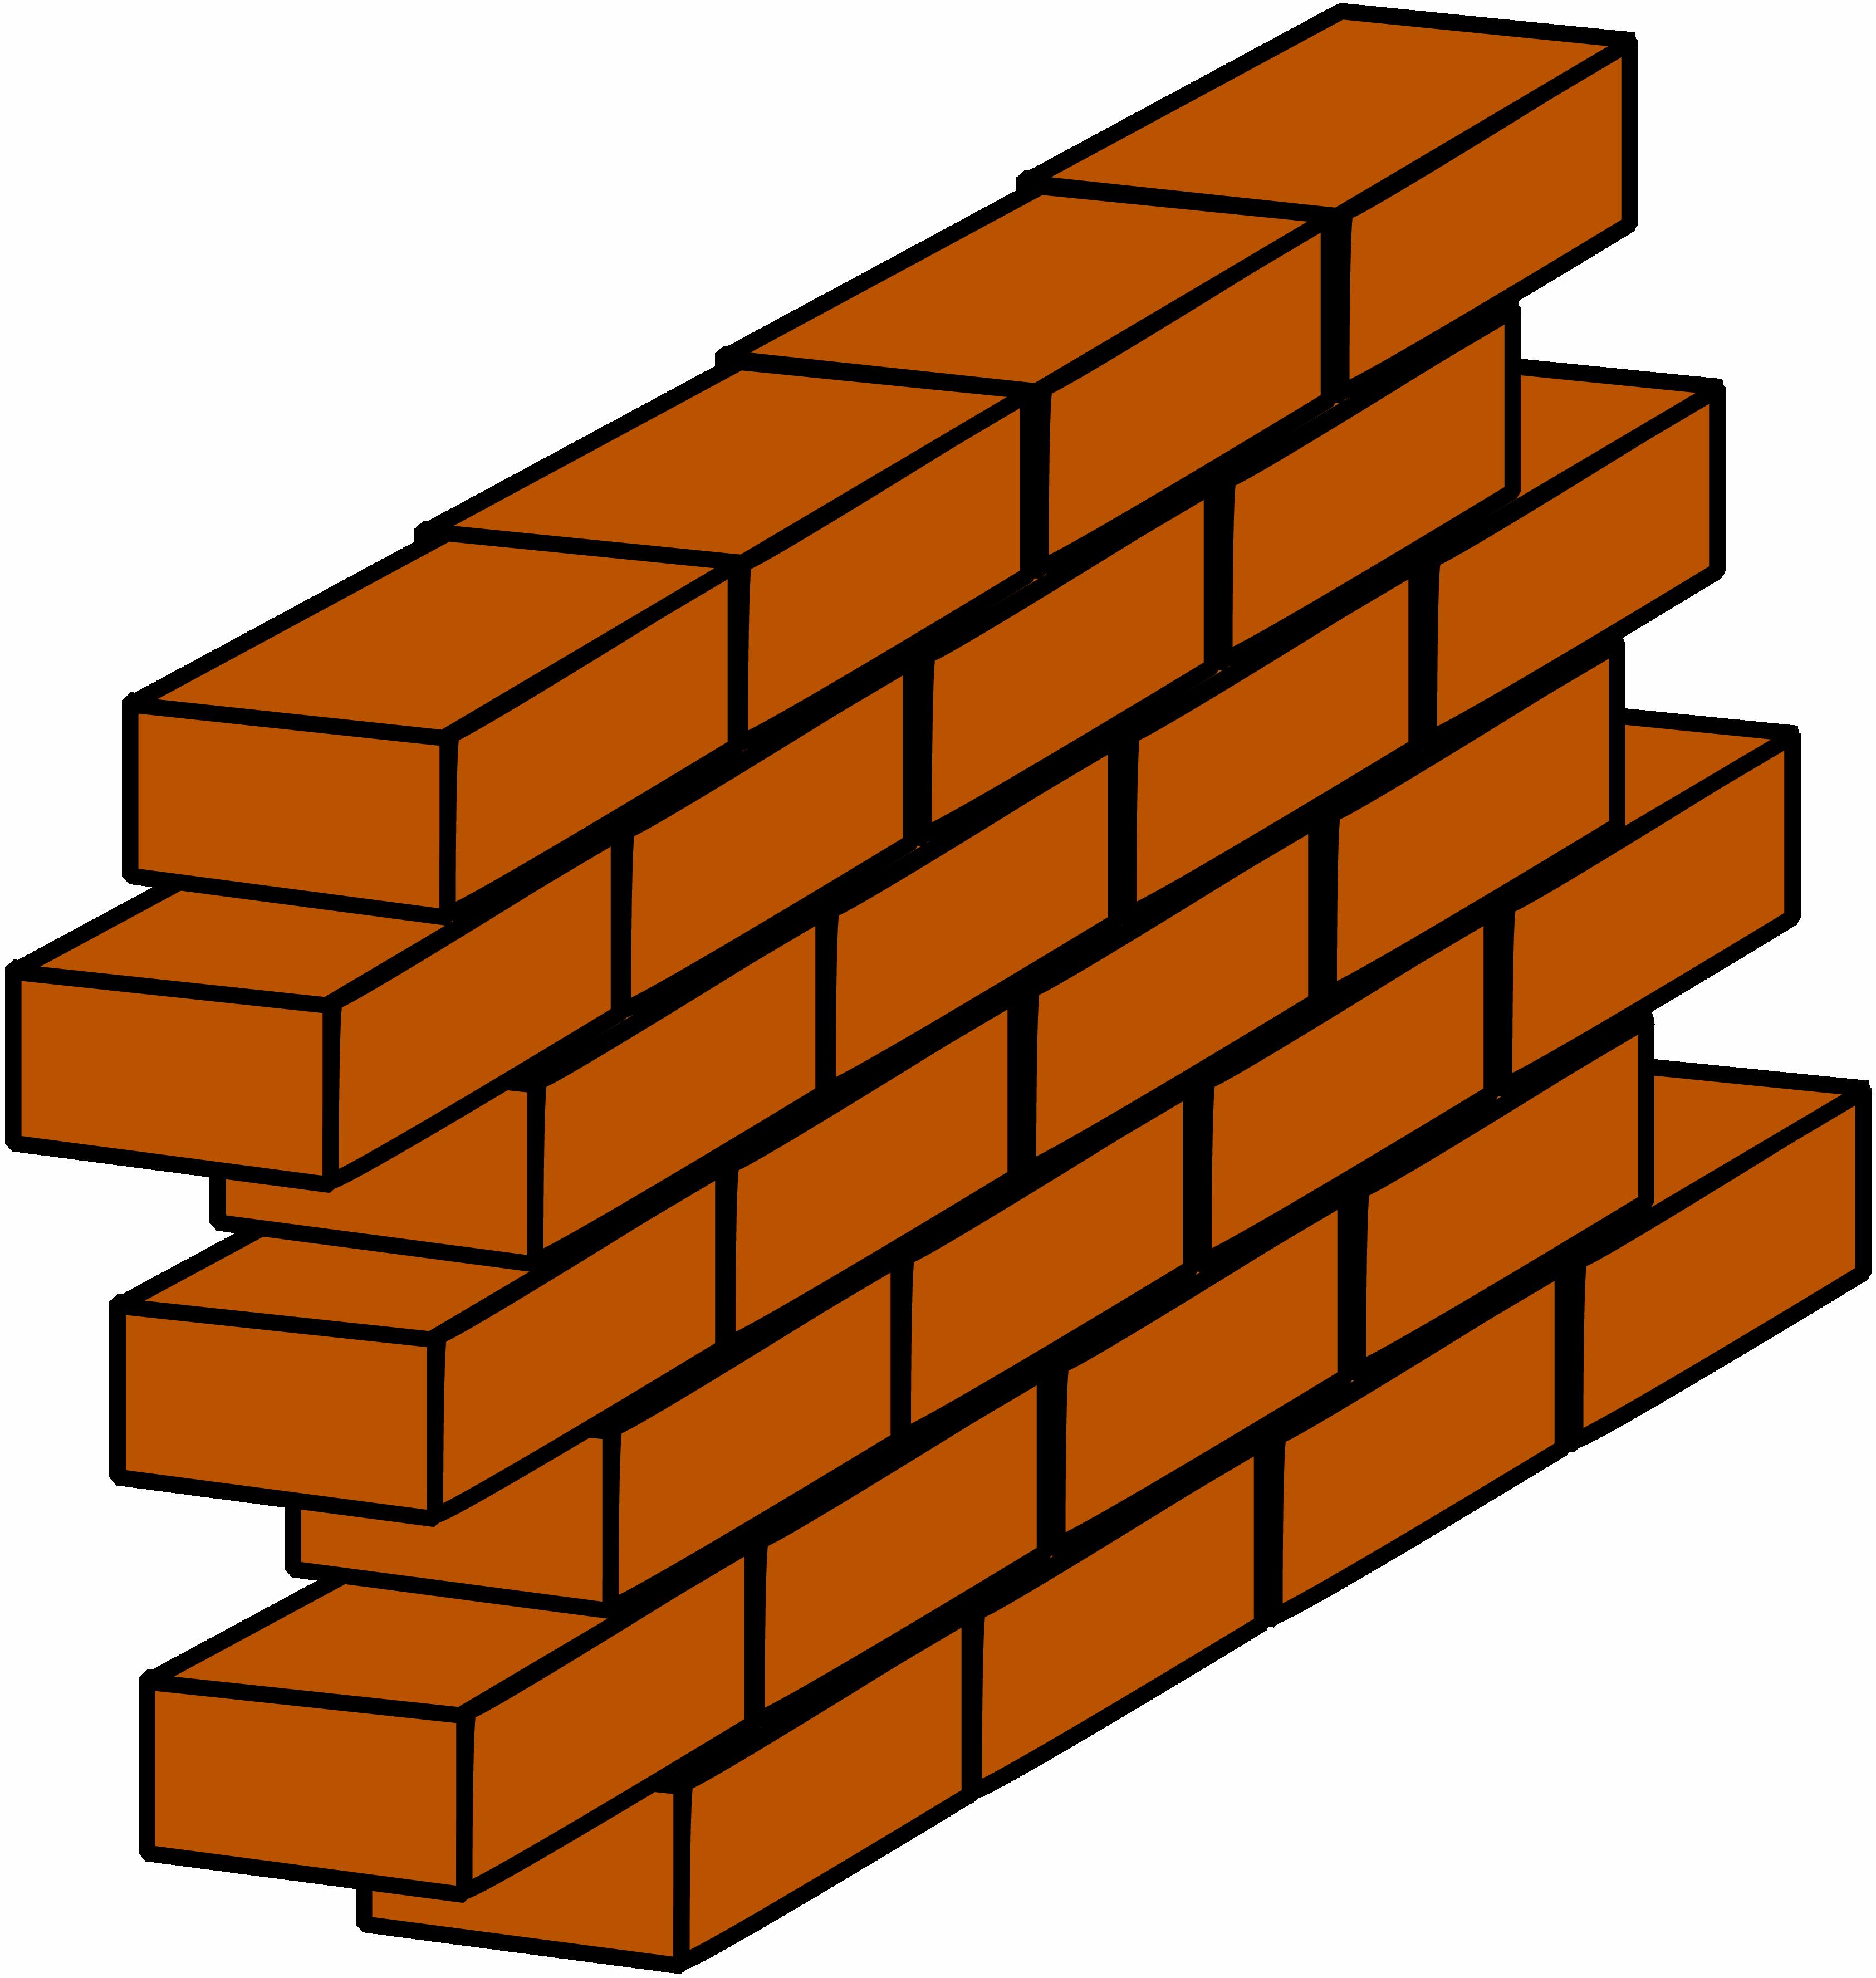 Free Brick Wall Cliparts, Download Free Clip Art, Free Clip.